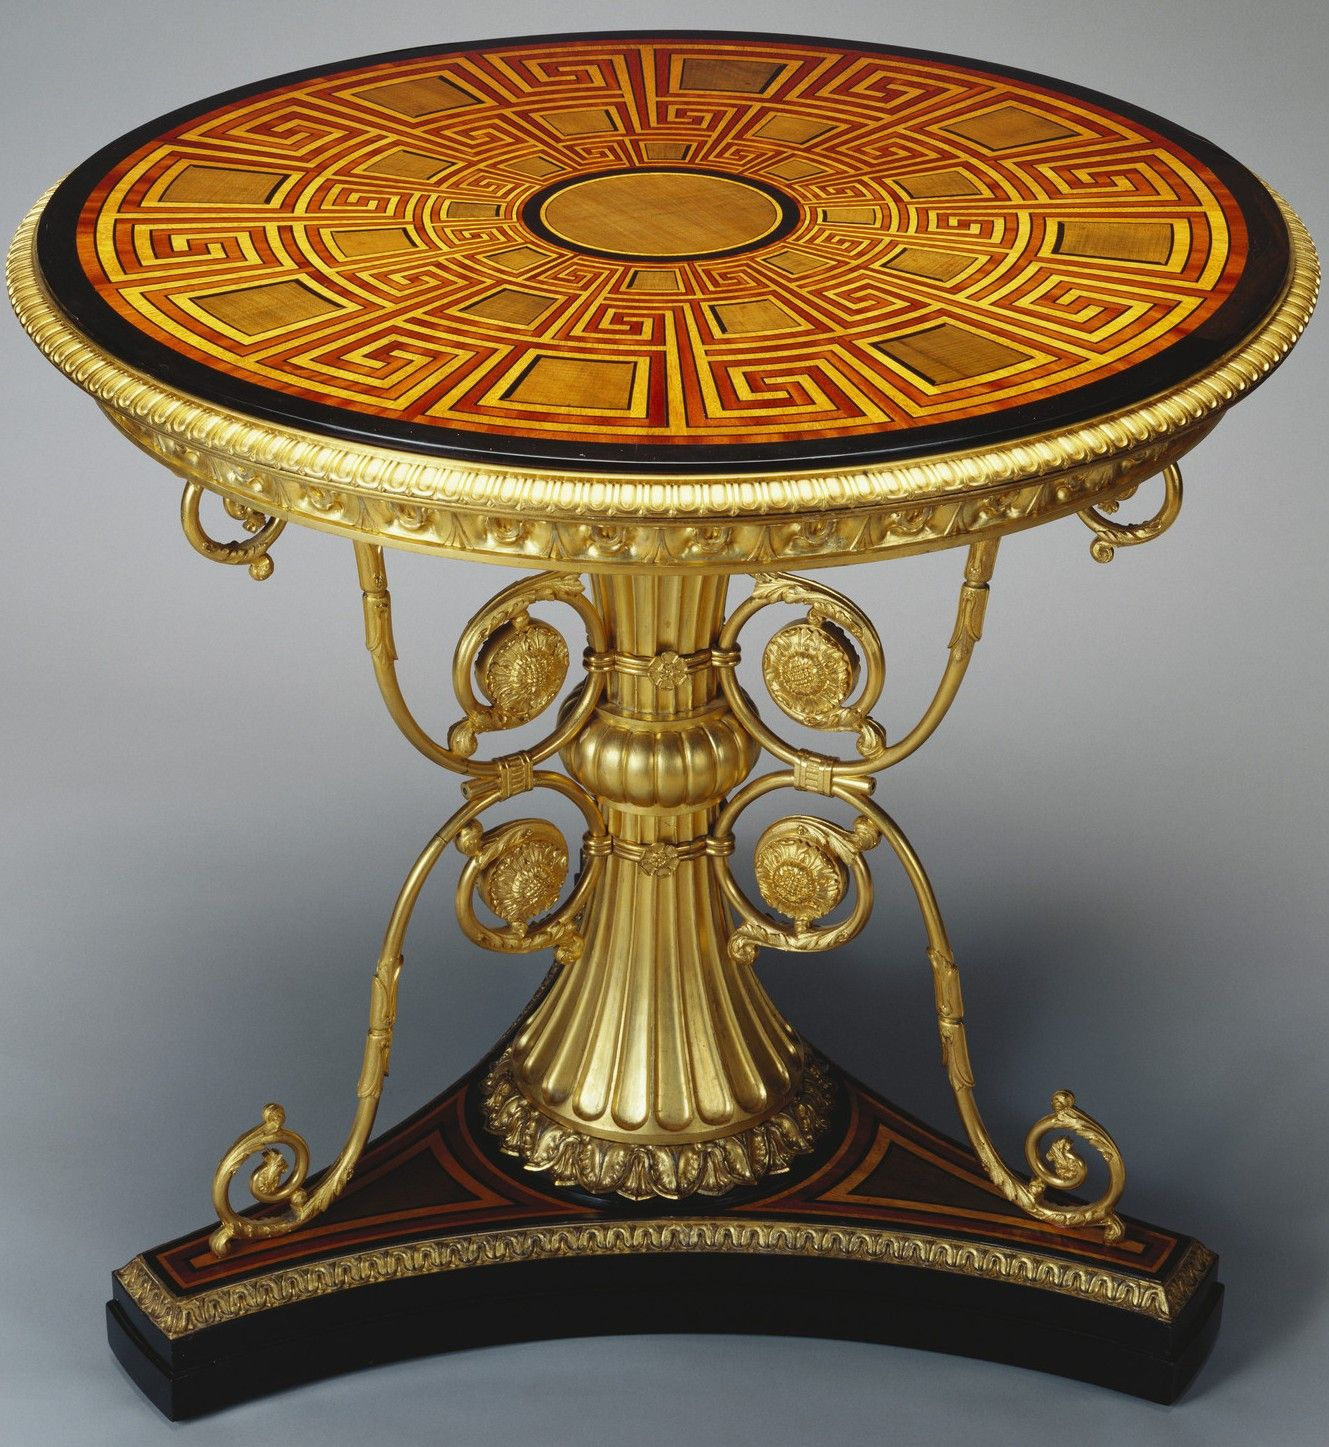 In The Royal Collection by Morel & Seddons 1828 England Circular ...